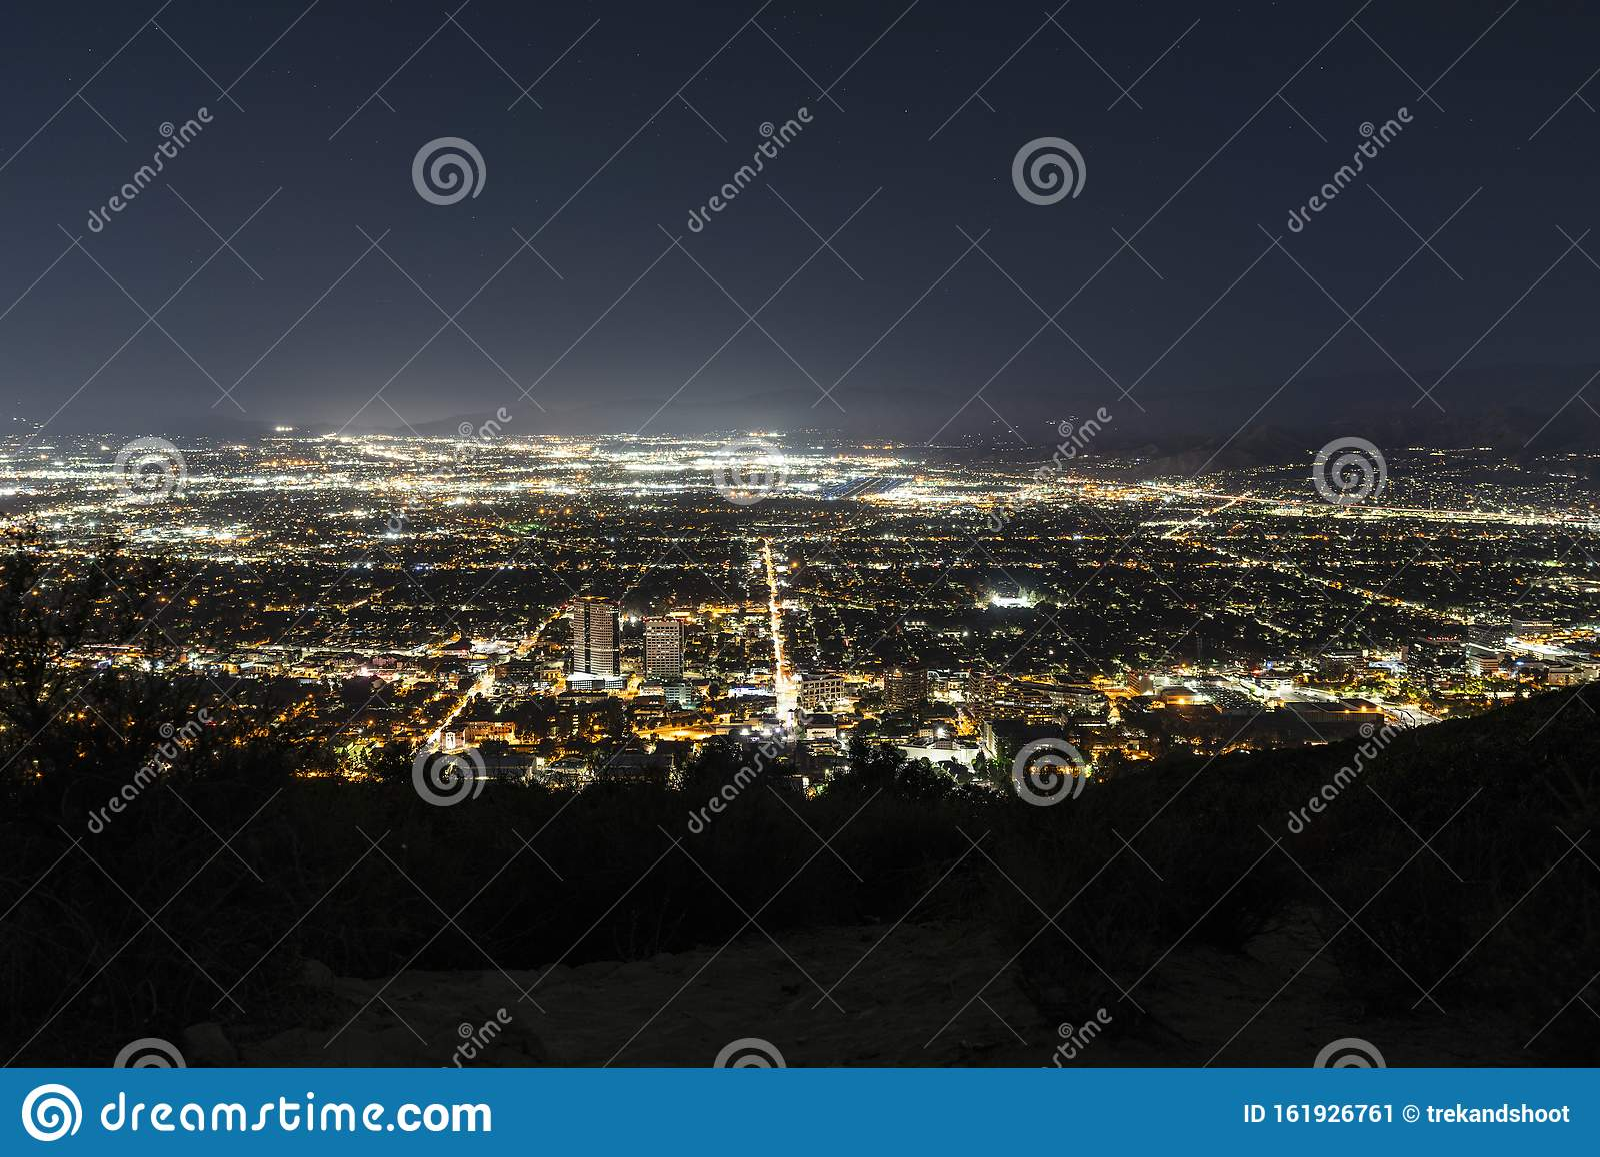 Burbank and San Fernando Valley Night Lights Stock Image   Image ...